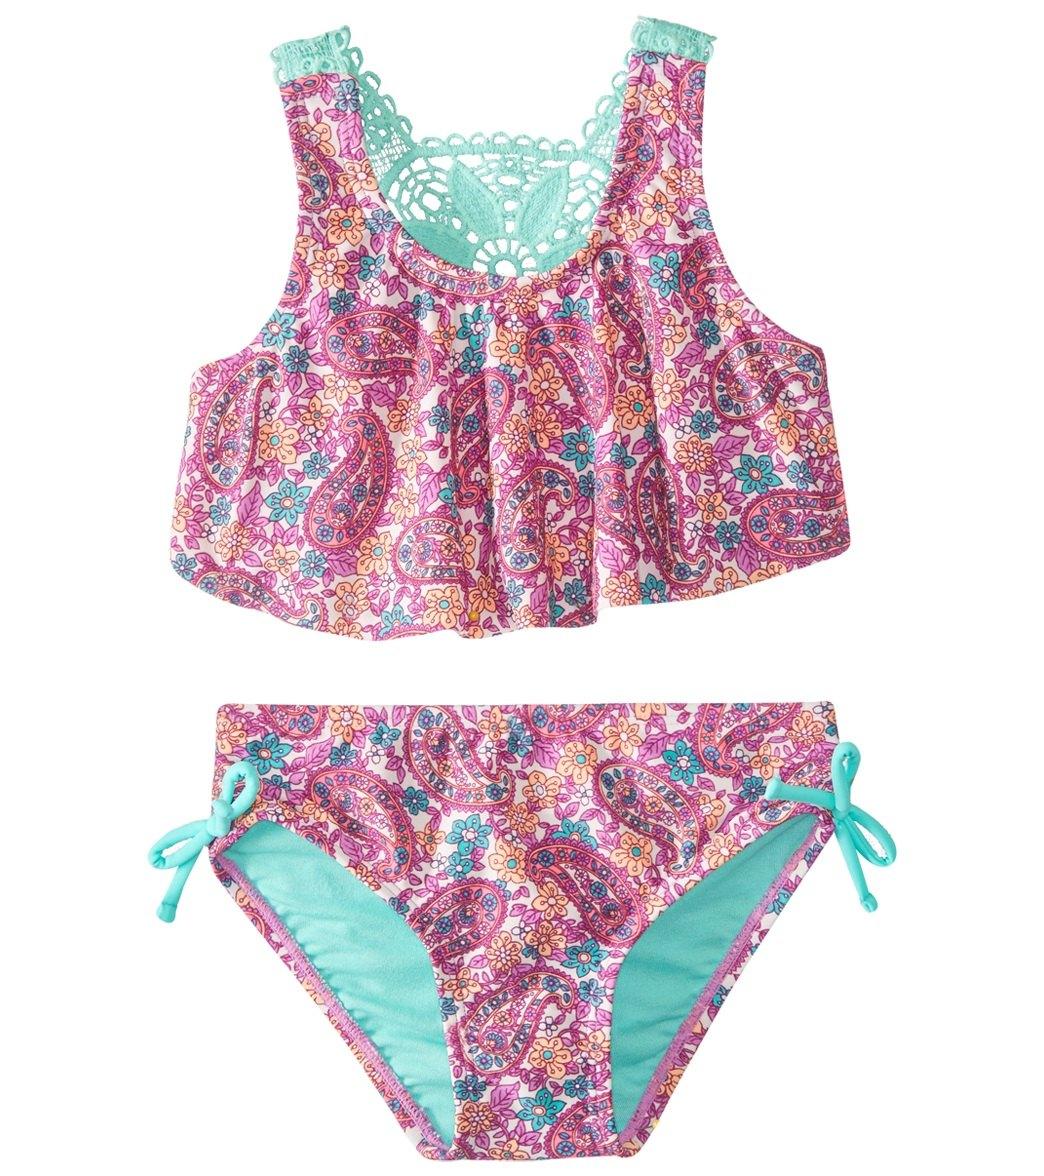 8e157e01733cf Hula Star Girls' Paisley Dream Two Piece Bikini (Toddler, Little Kid) at  SwimOutlet.com